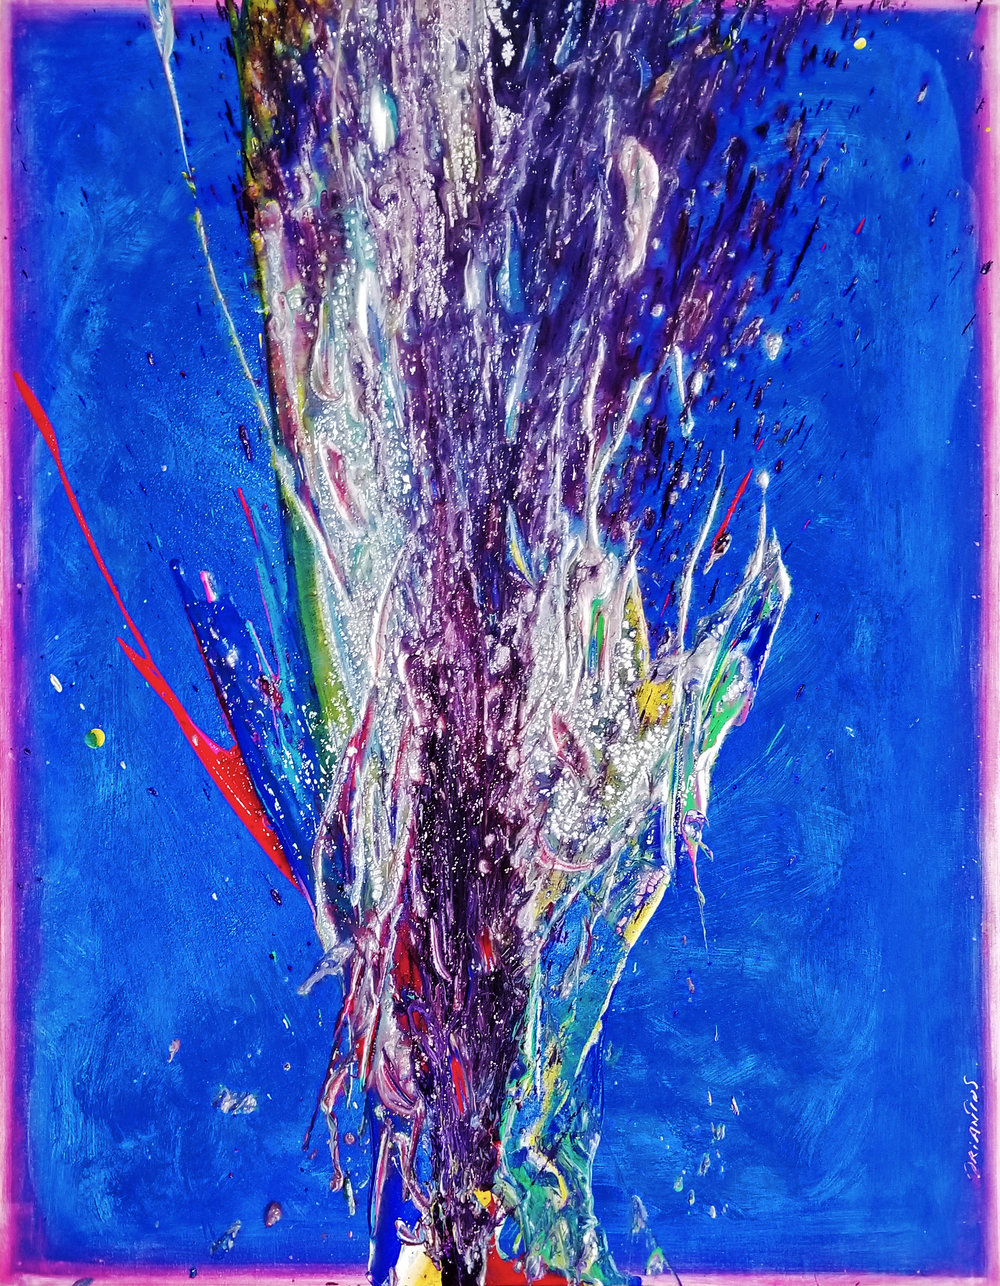 "Splash of Color 2 #141, 2019, acrylic on canvas, 40"" x 32"" (101.6 x 81 cm)"